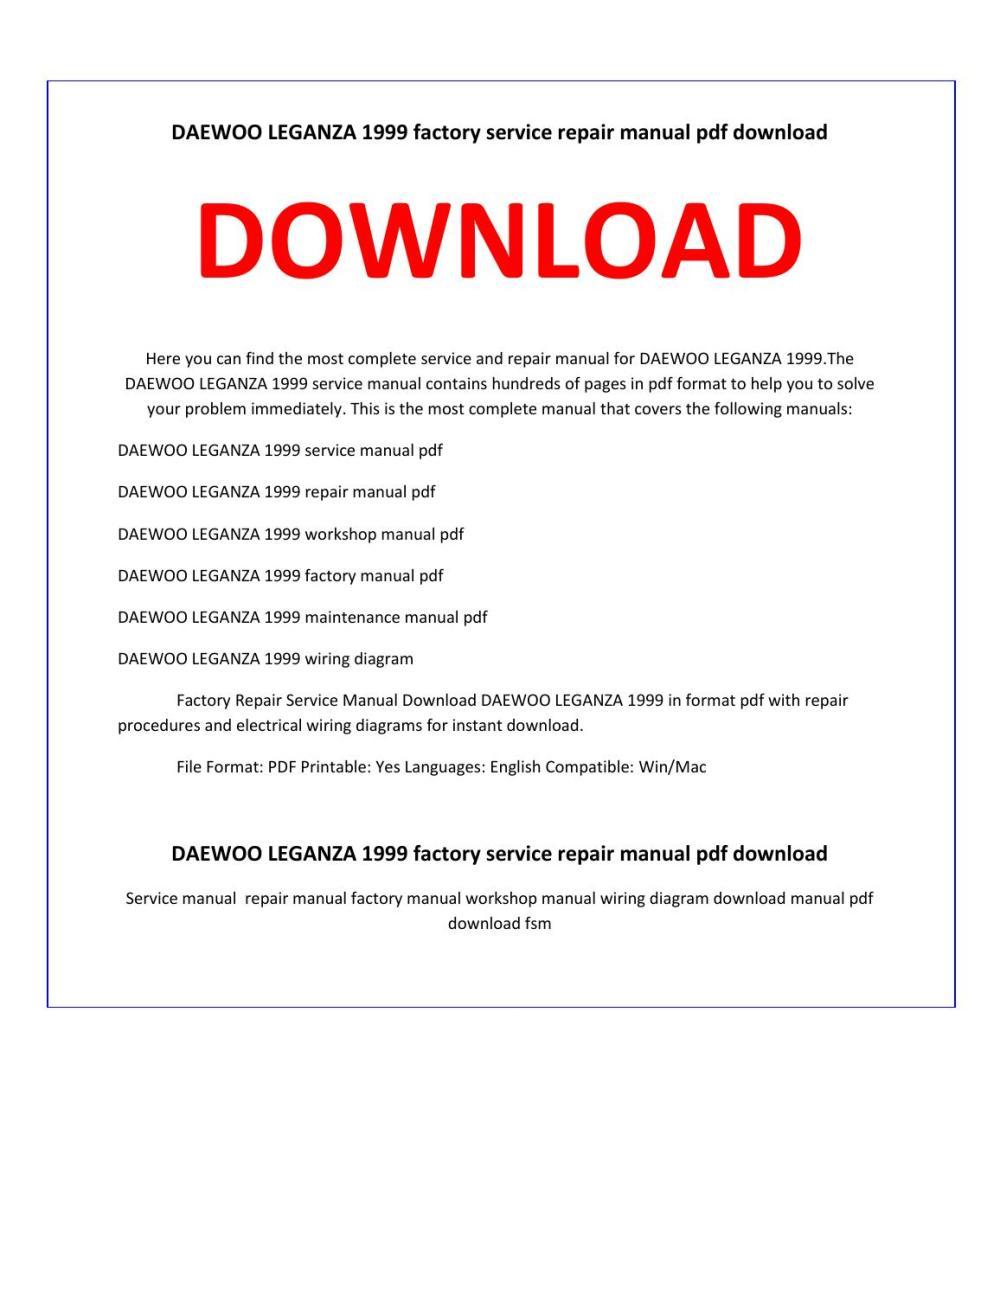 medium resolution of daewoo leganza 1999 service repair manual